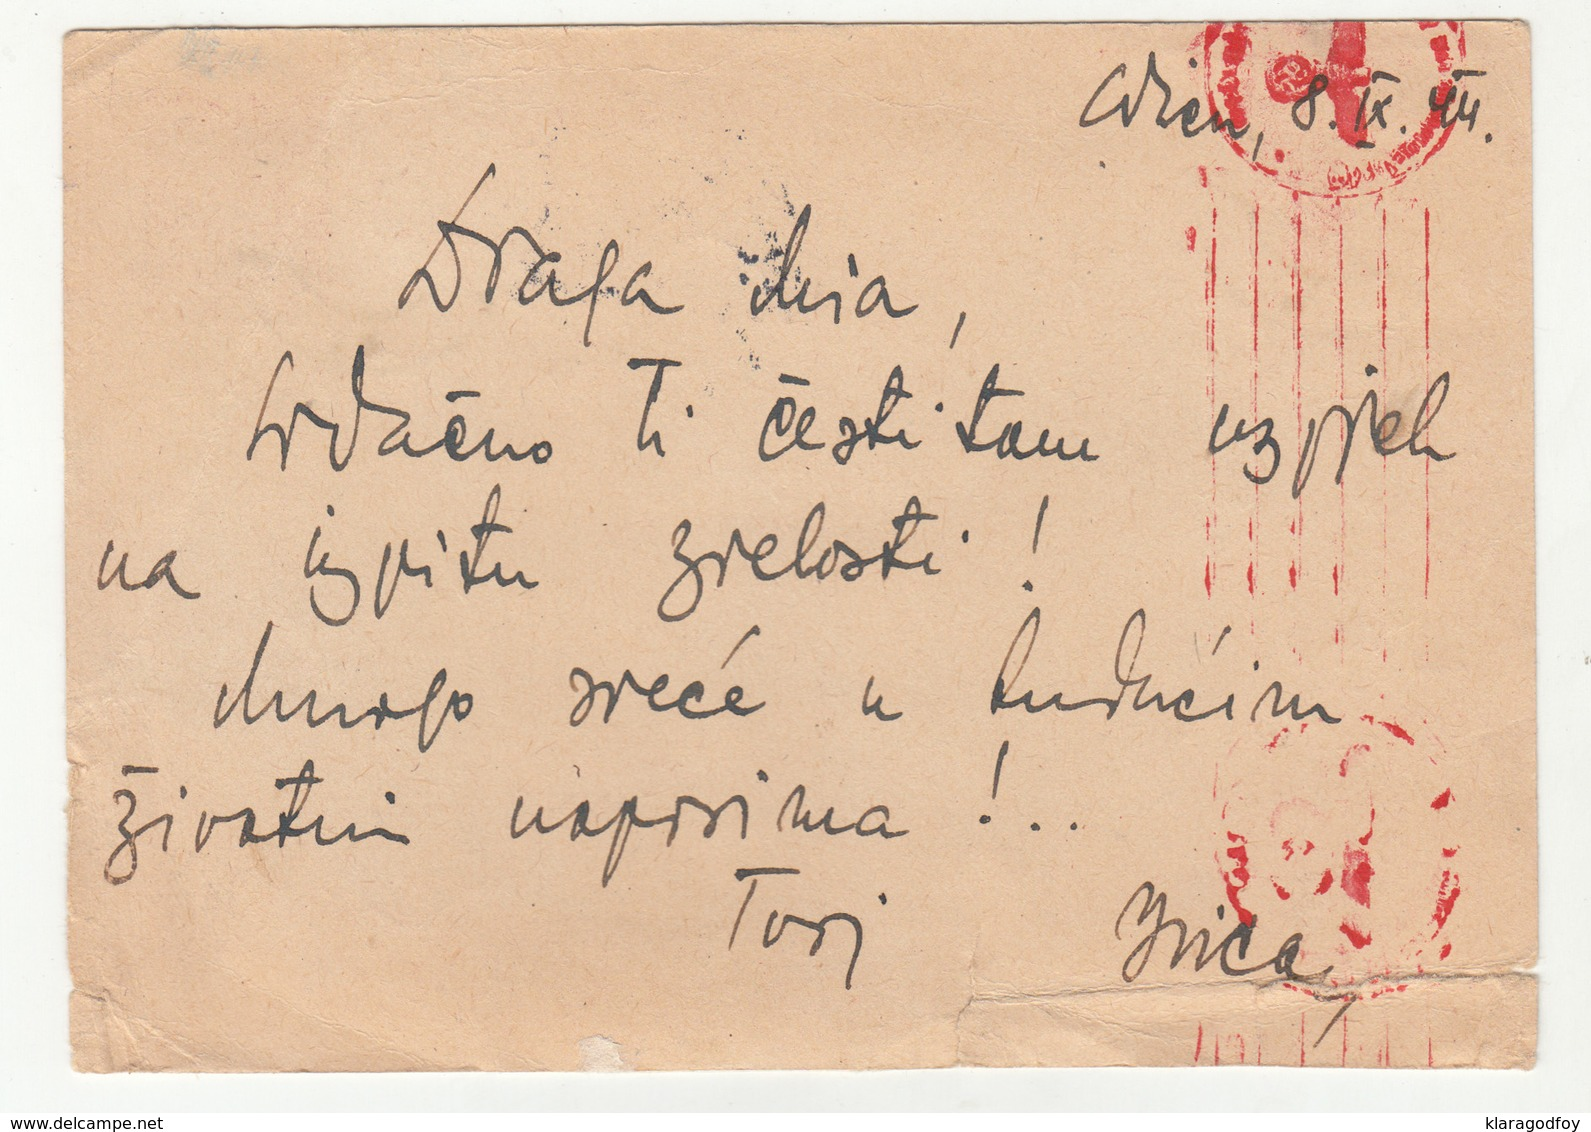 Germany Reich Postal Stationery Postcard Travelled 1944 Air Mail Wien To Hrvatski Karlovci Censored B190720 - Ganzsachen